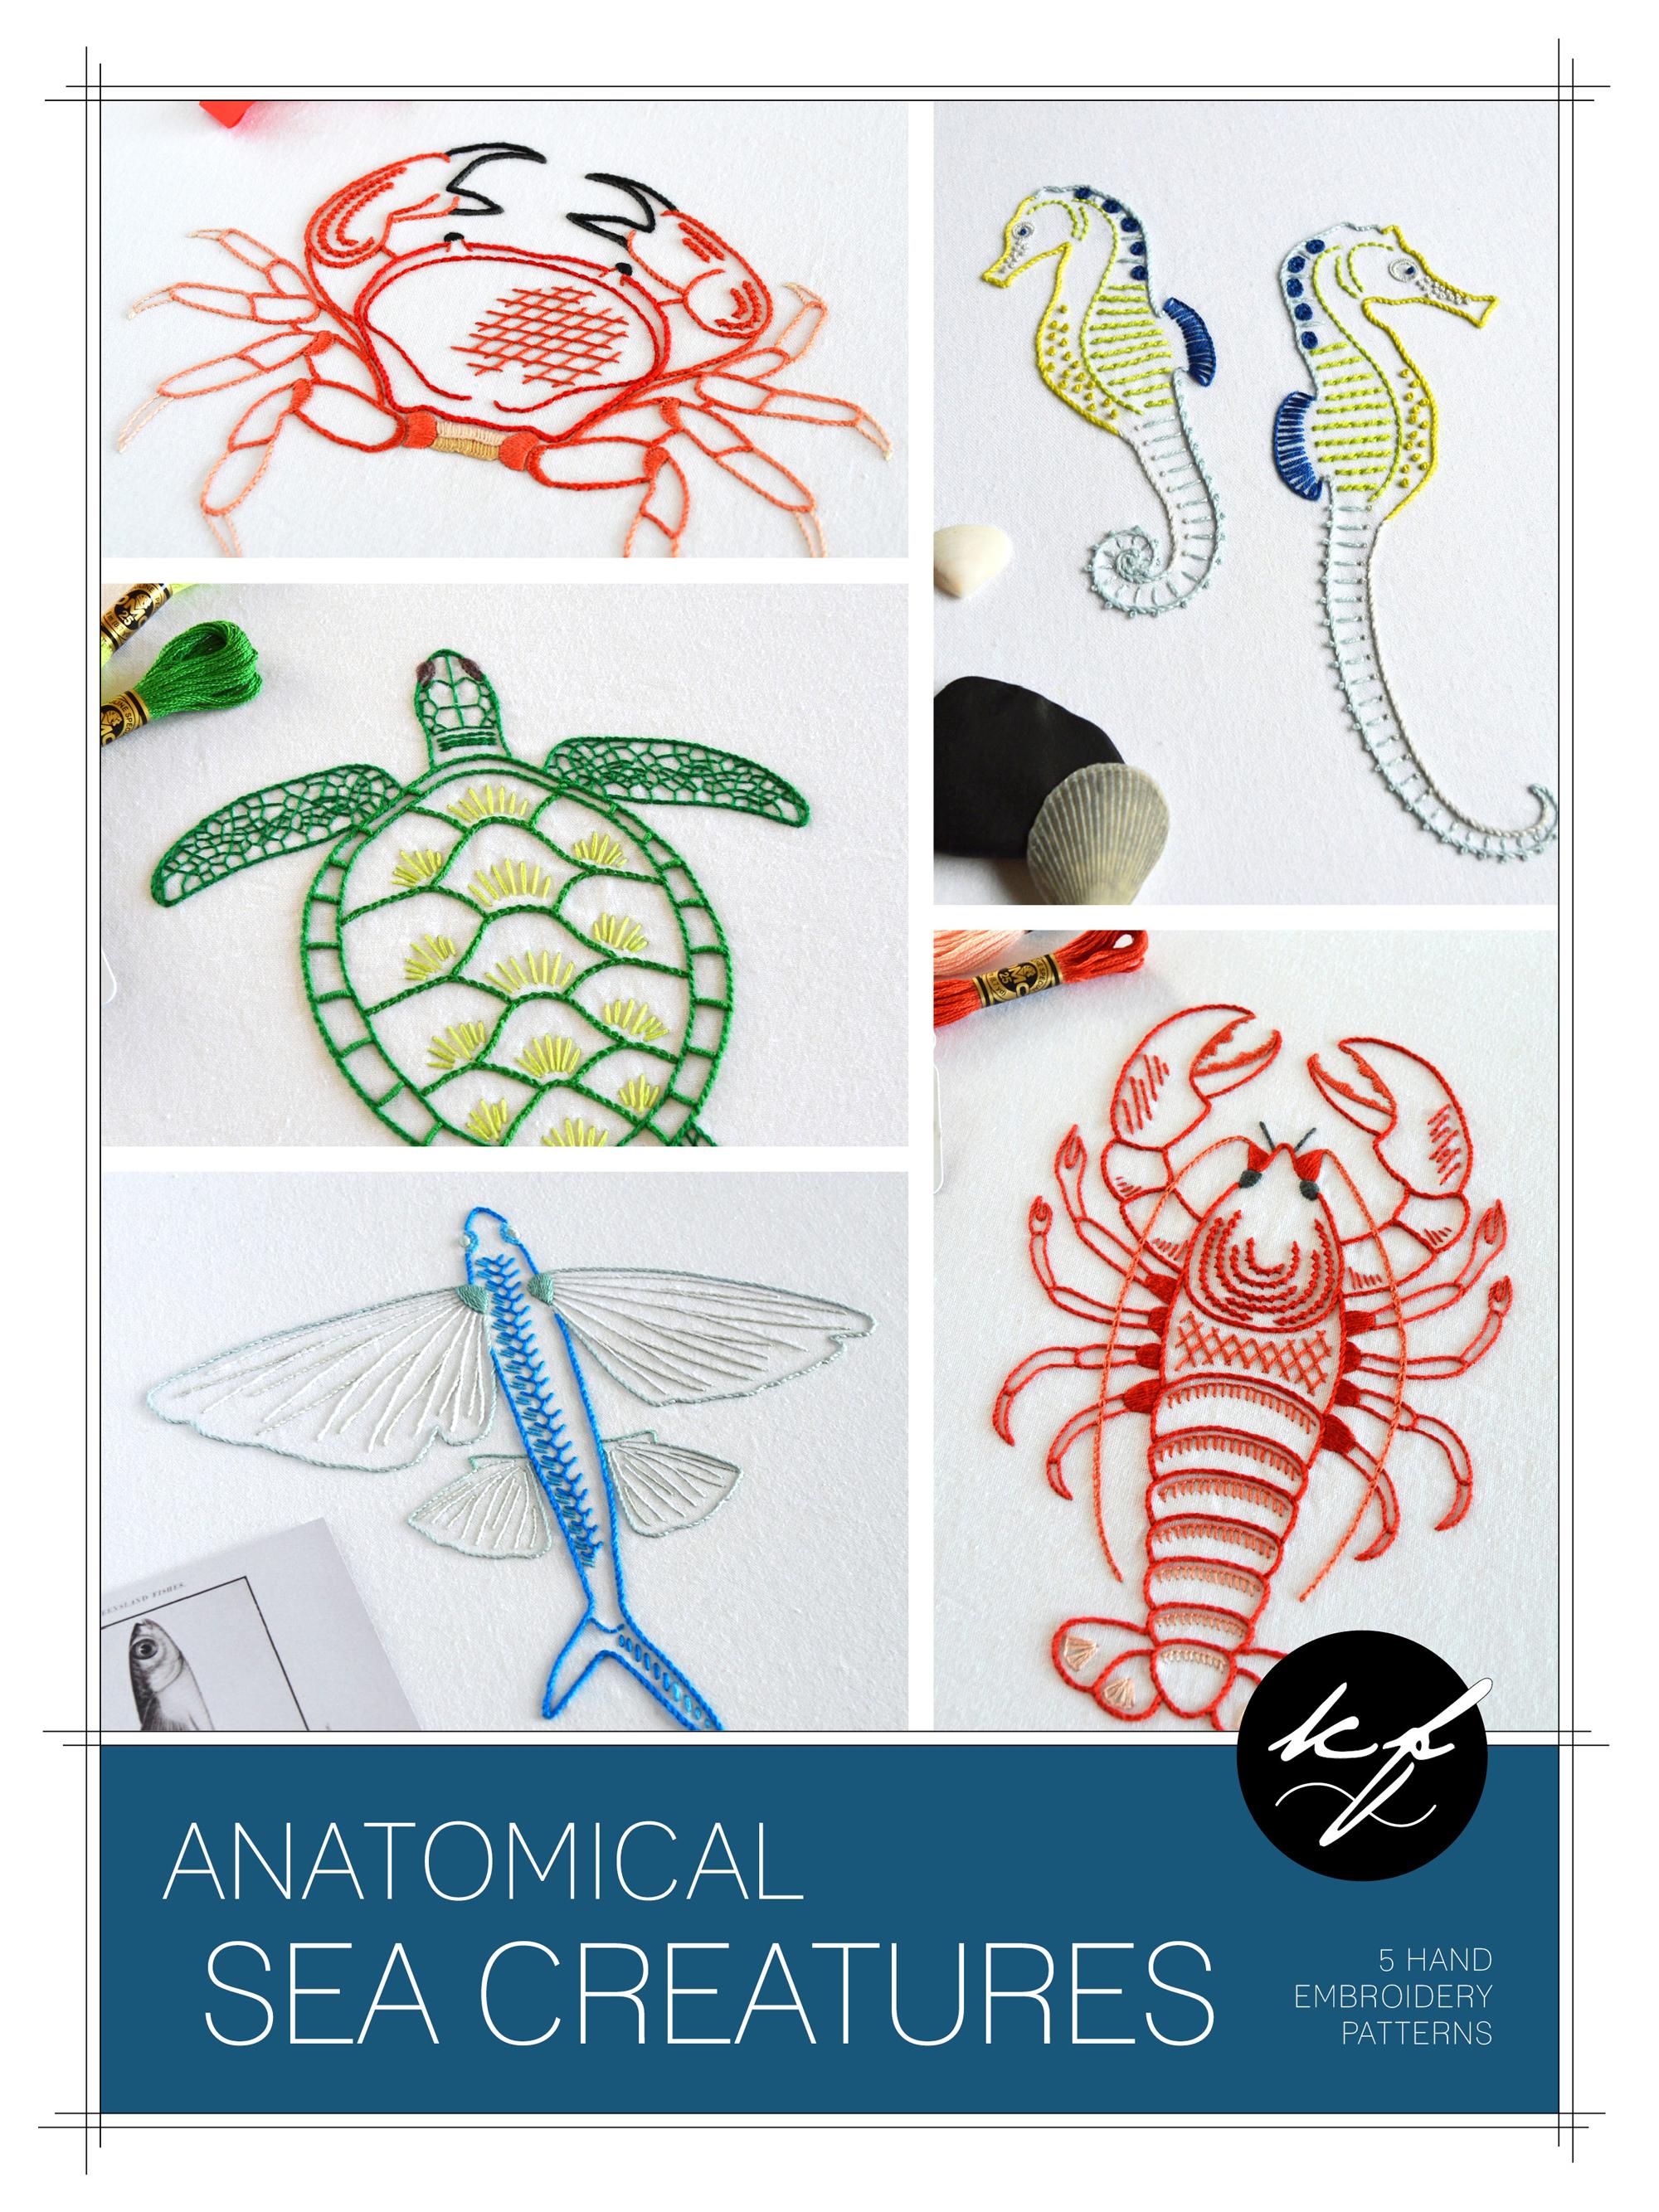 AnatomicalSeaCreaturesEmbroideryPattern_KellyFletcher.jpg